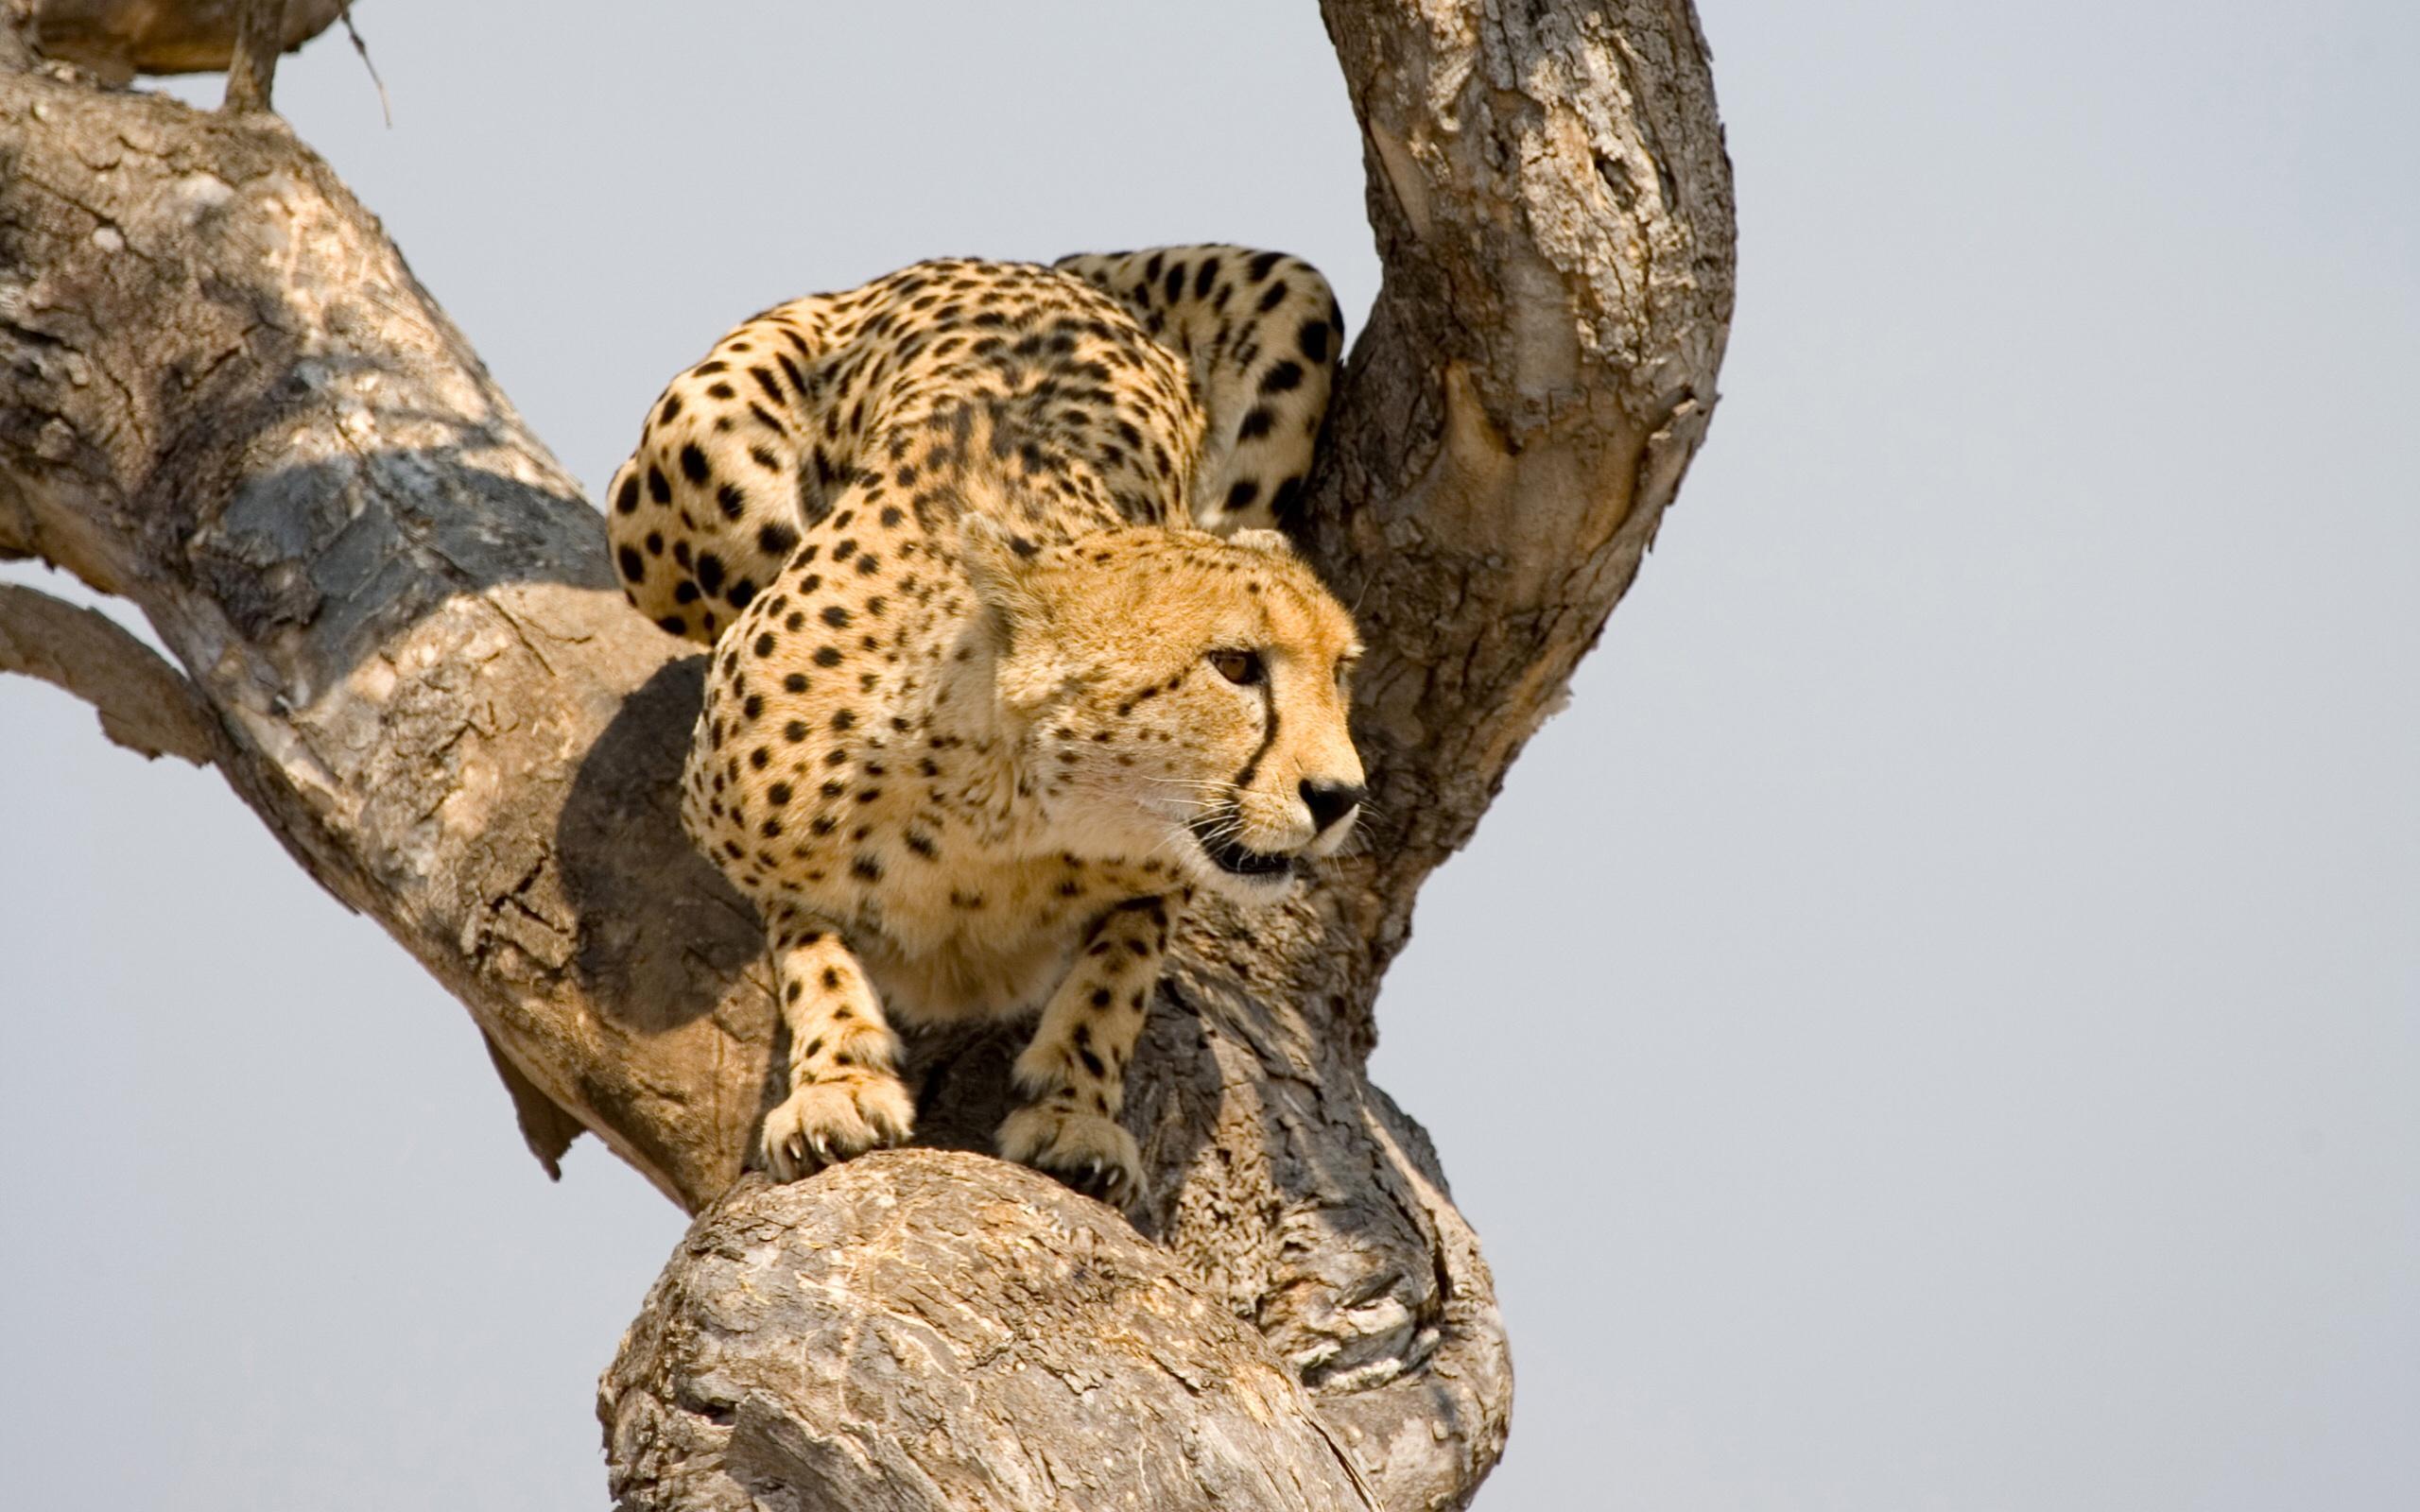 Cheetah Wallpaper Hd Cheetah Acinonyx Jubatus Pgcps Mess Reform Sasscer